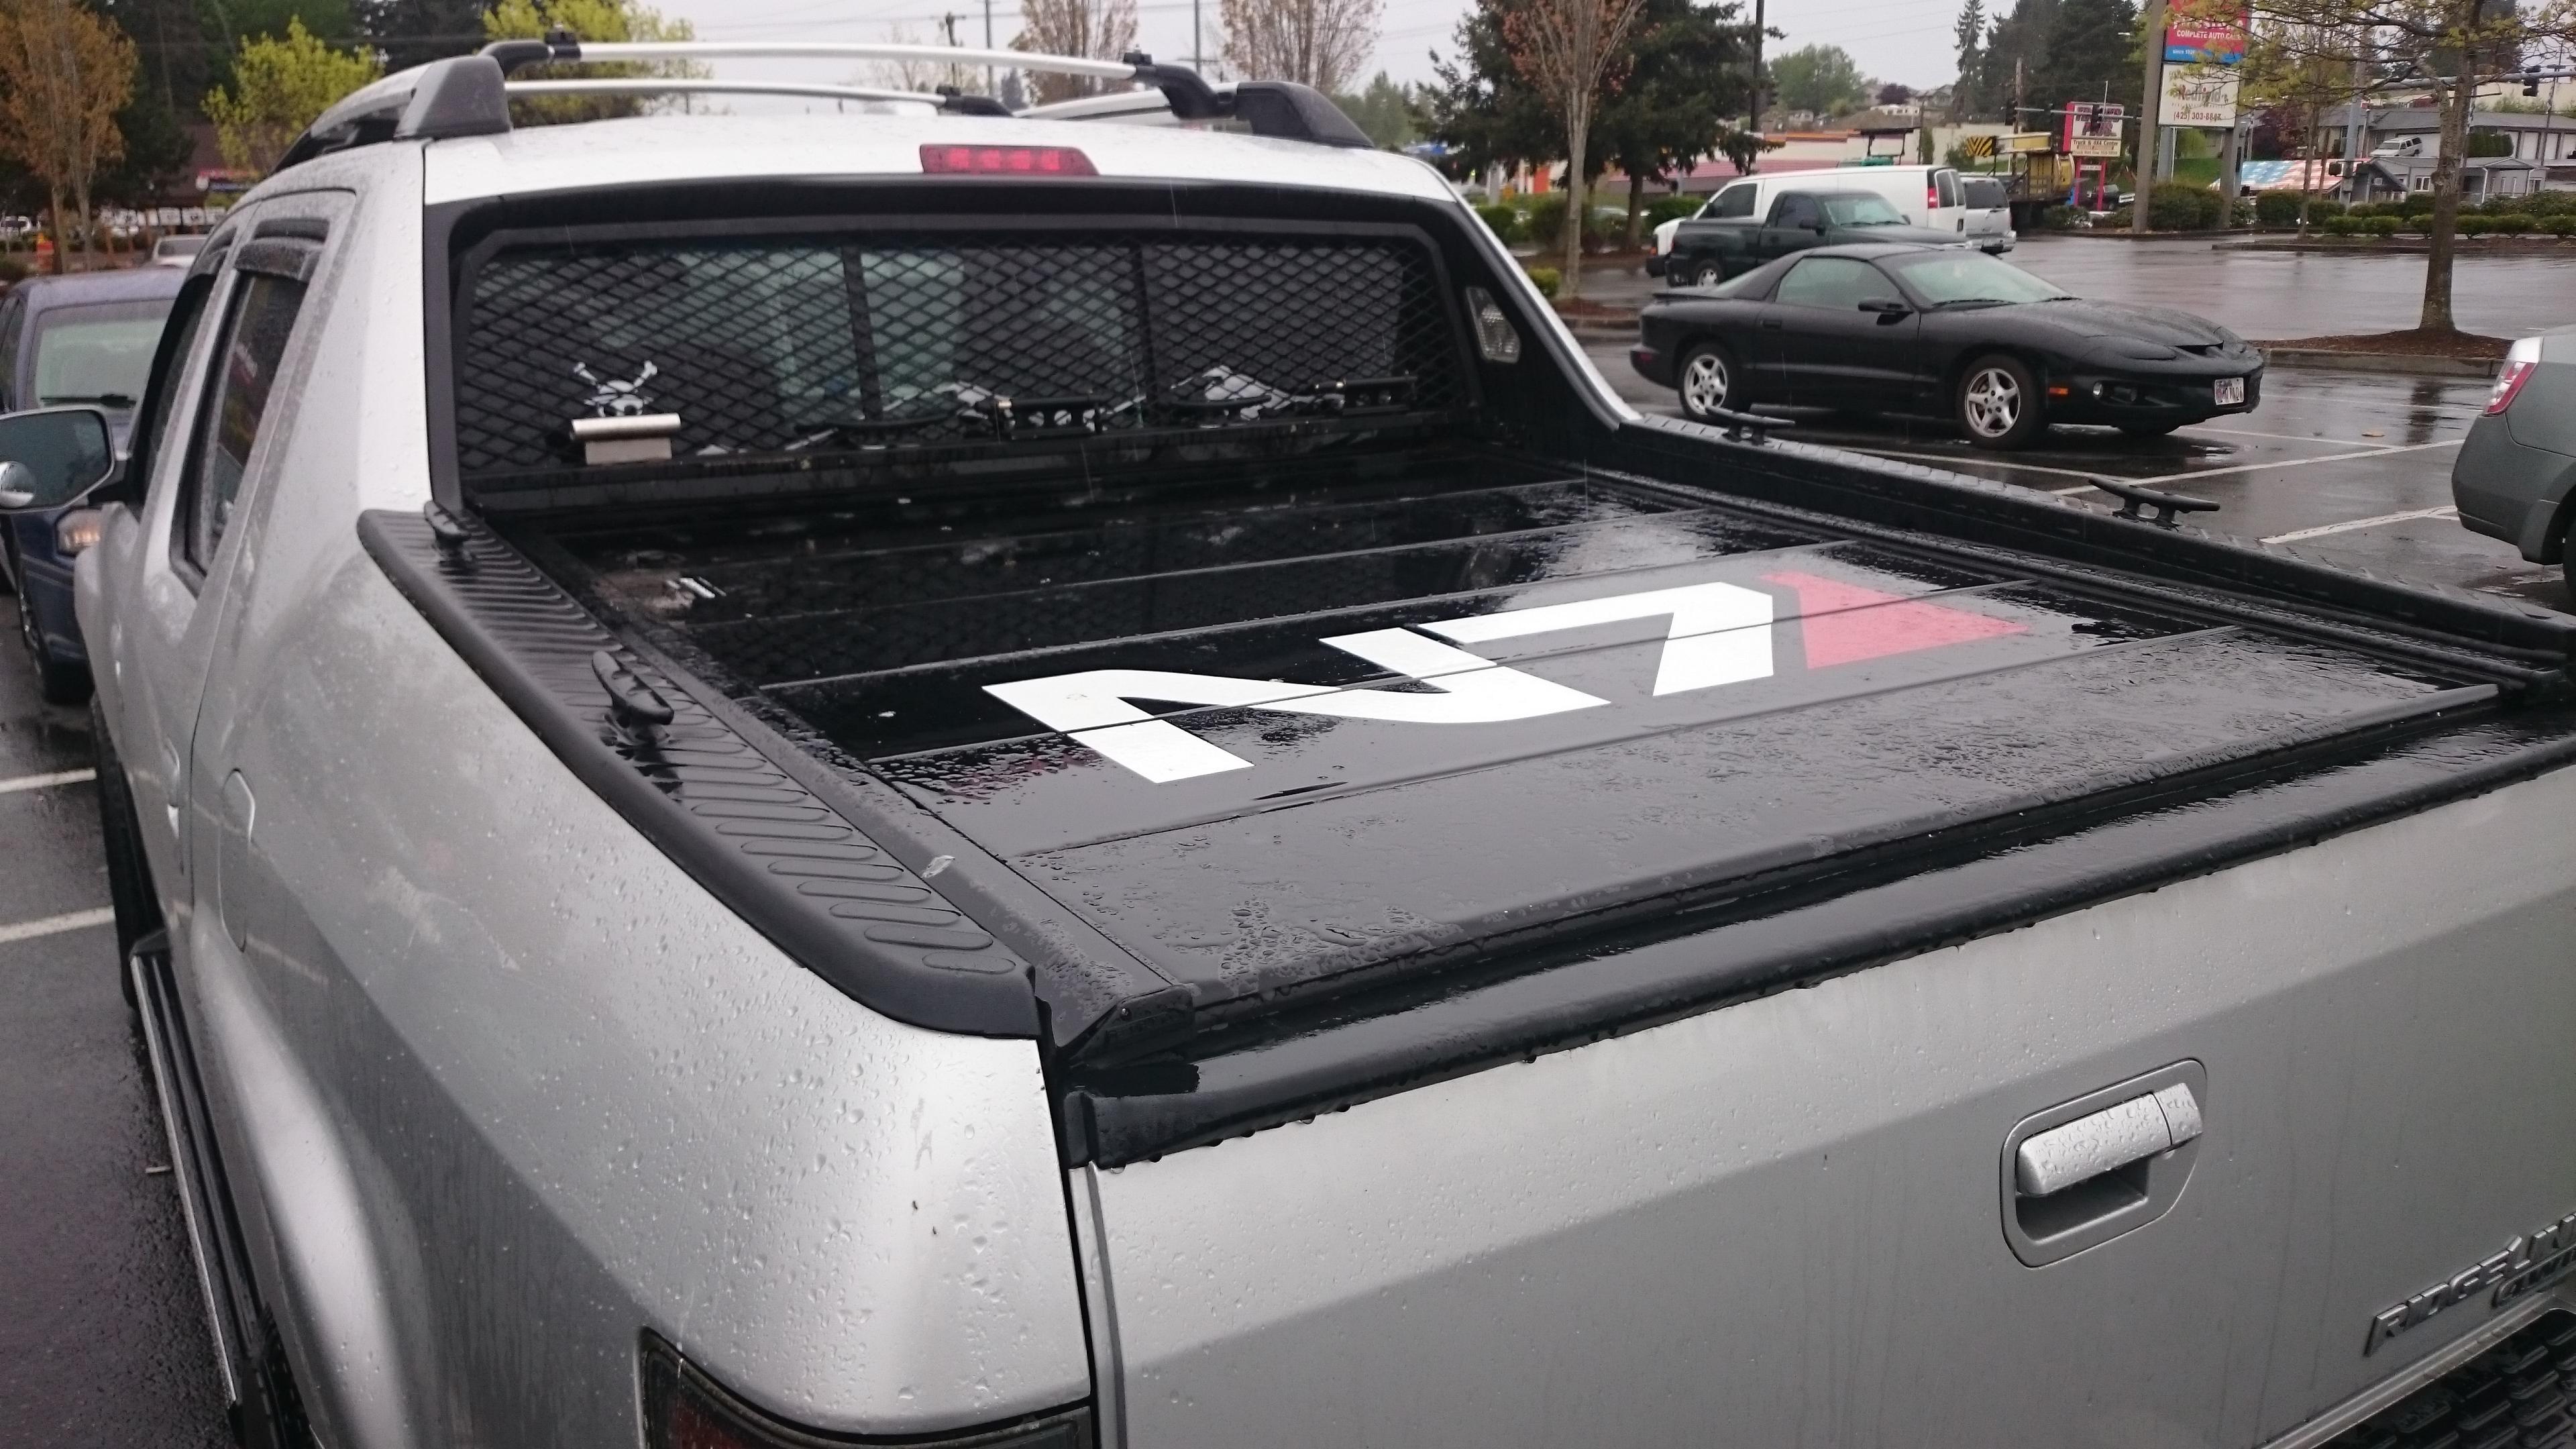 2009 Honda Ridgeline Pickup Truck Bed Covers Peragon